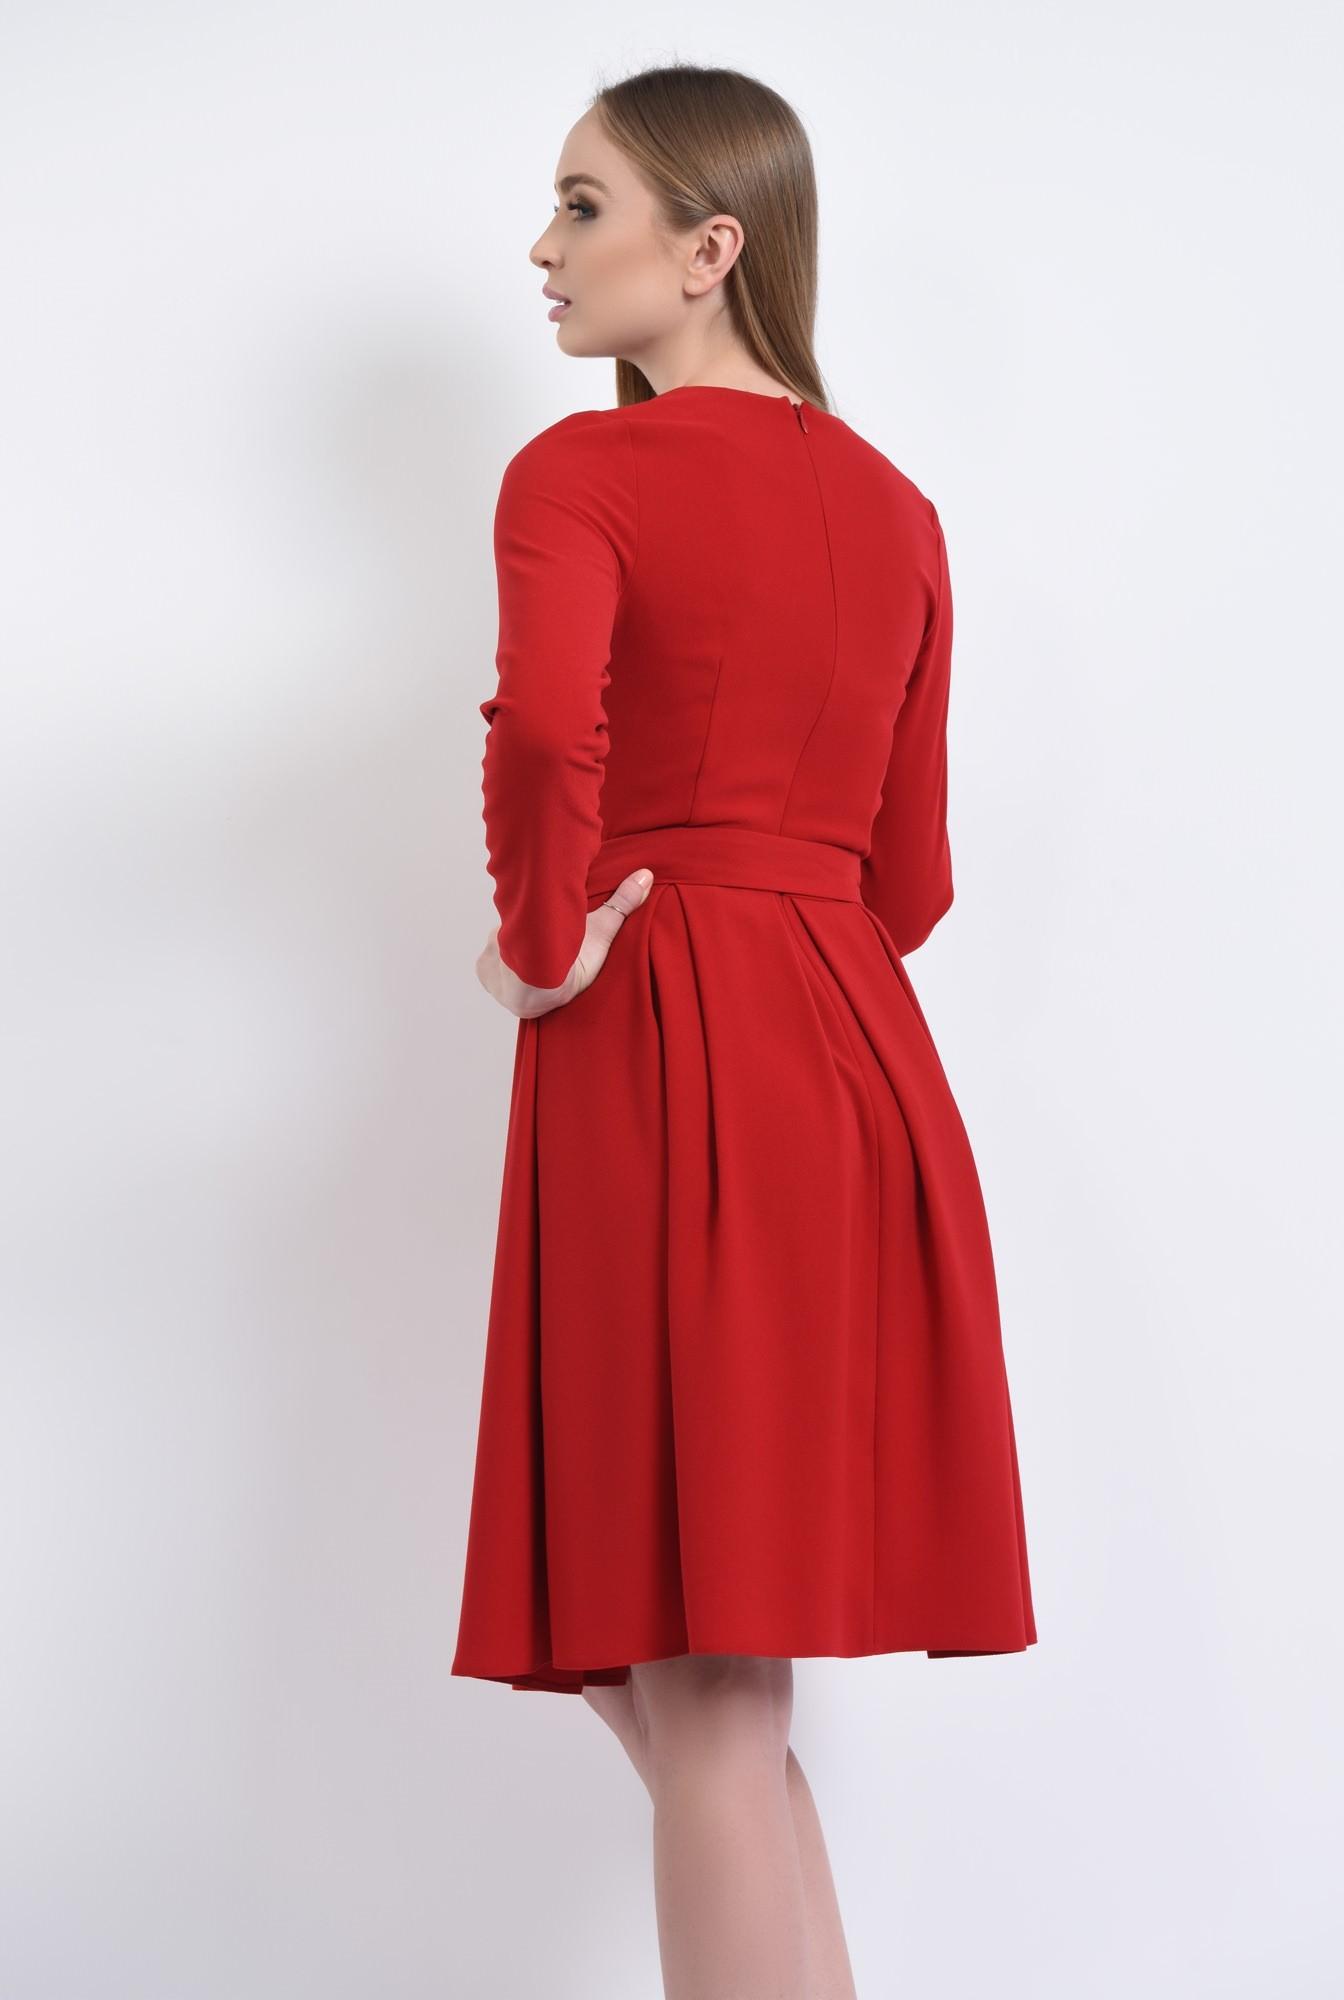 1 - rochie casual, midi, plisata, cordon, rosu